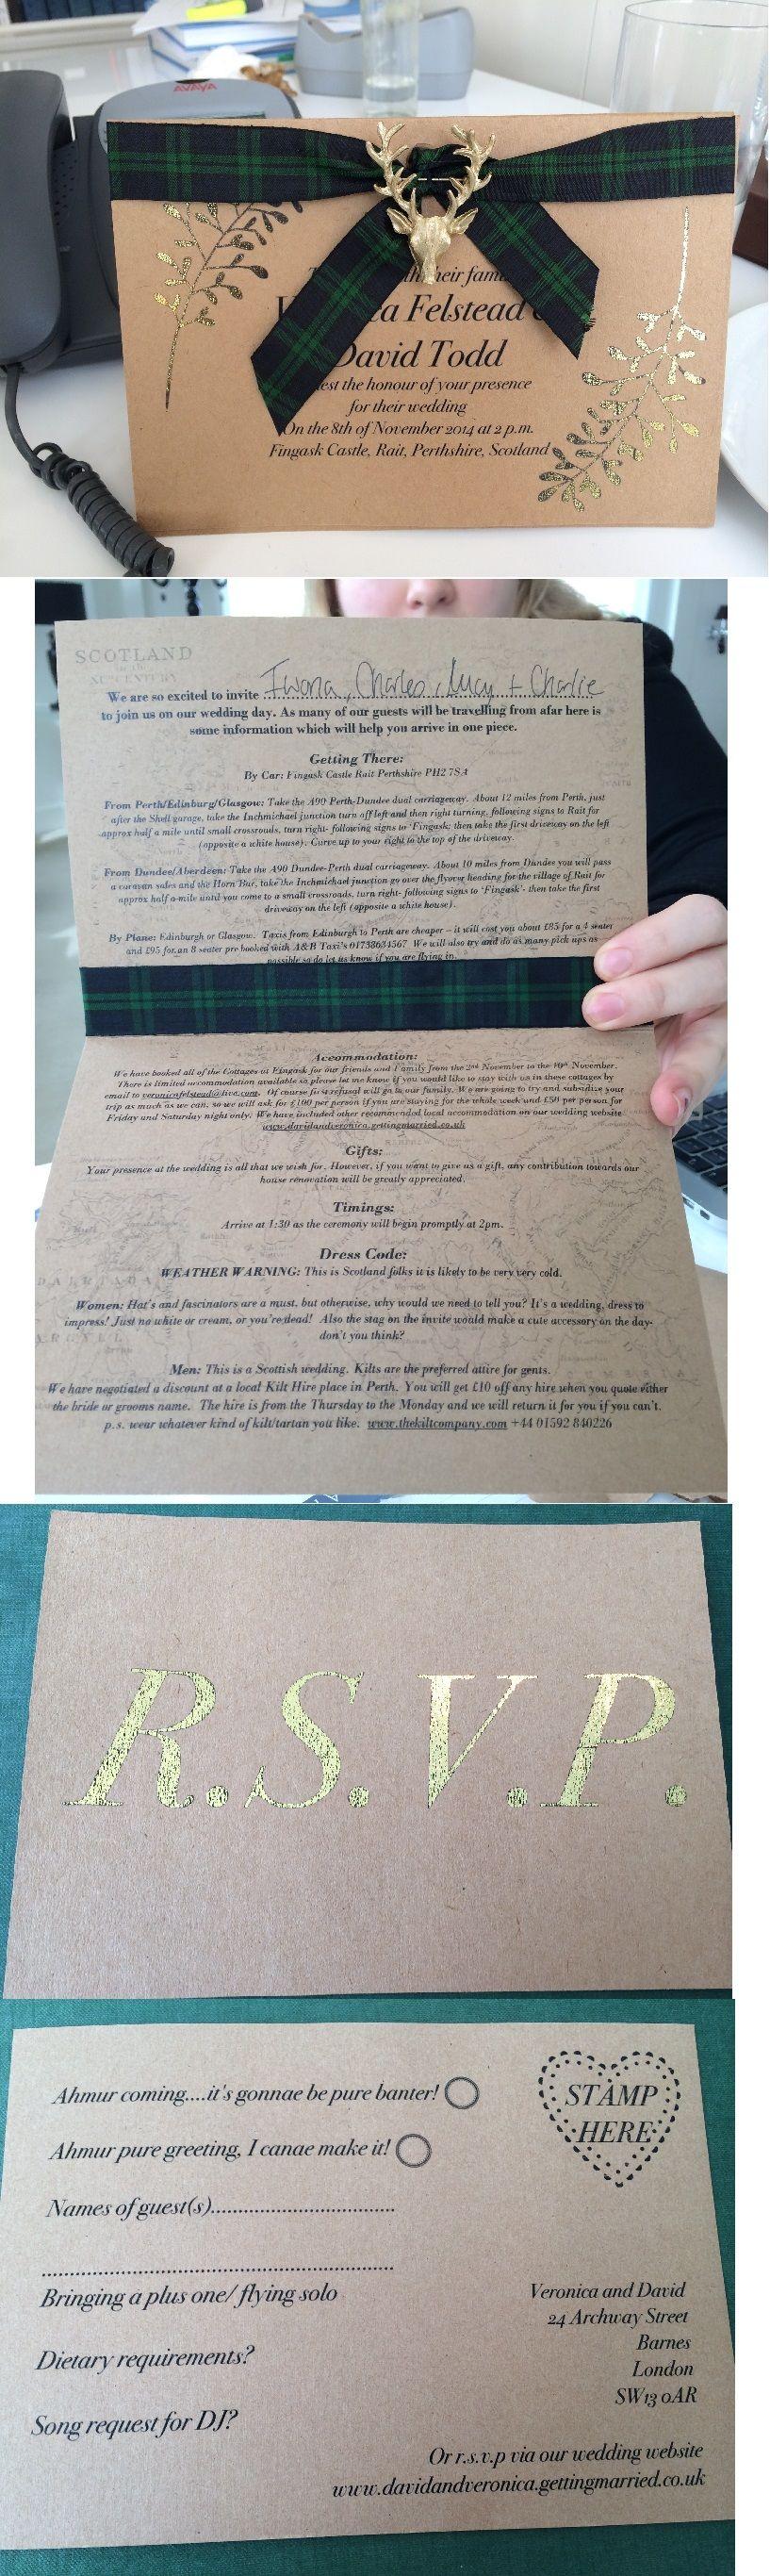 DIT Scottish Gold Wedding Invitation Black Watch Tartan. These ...